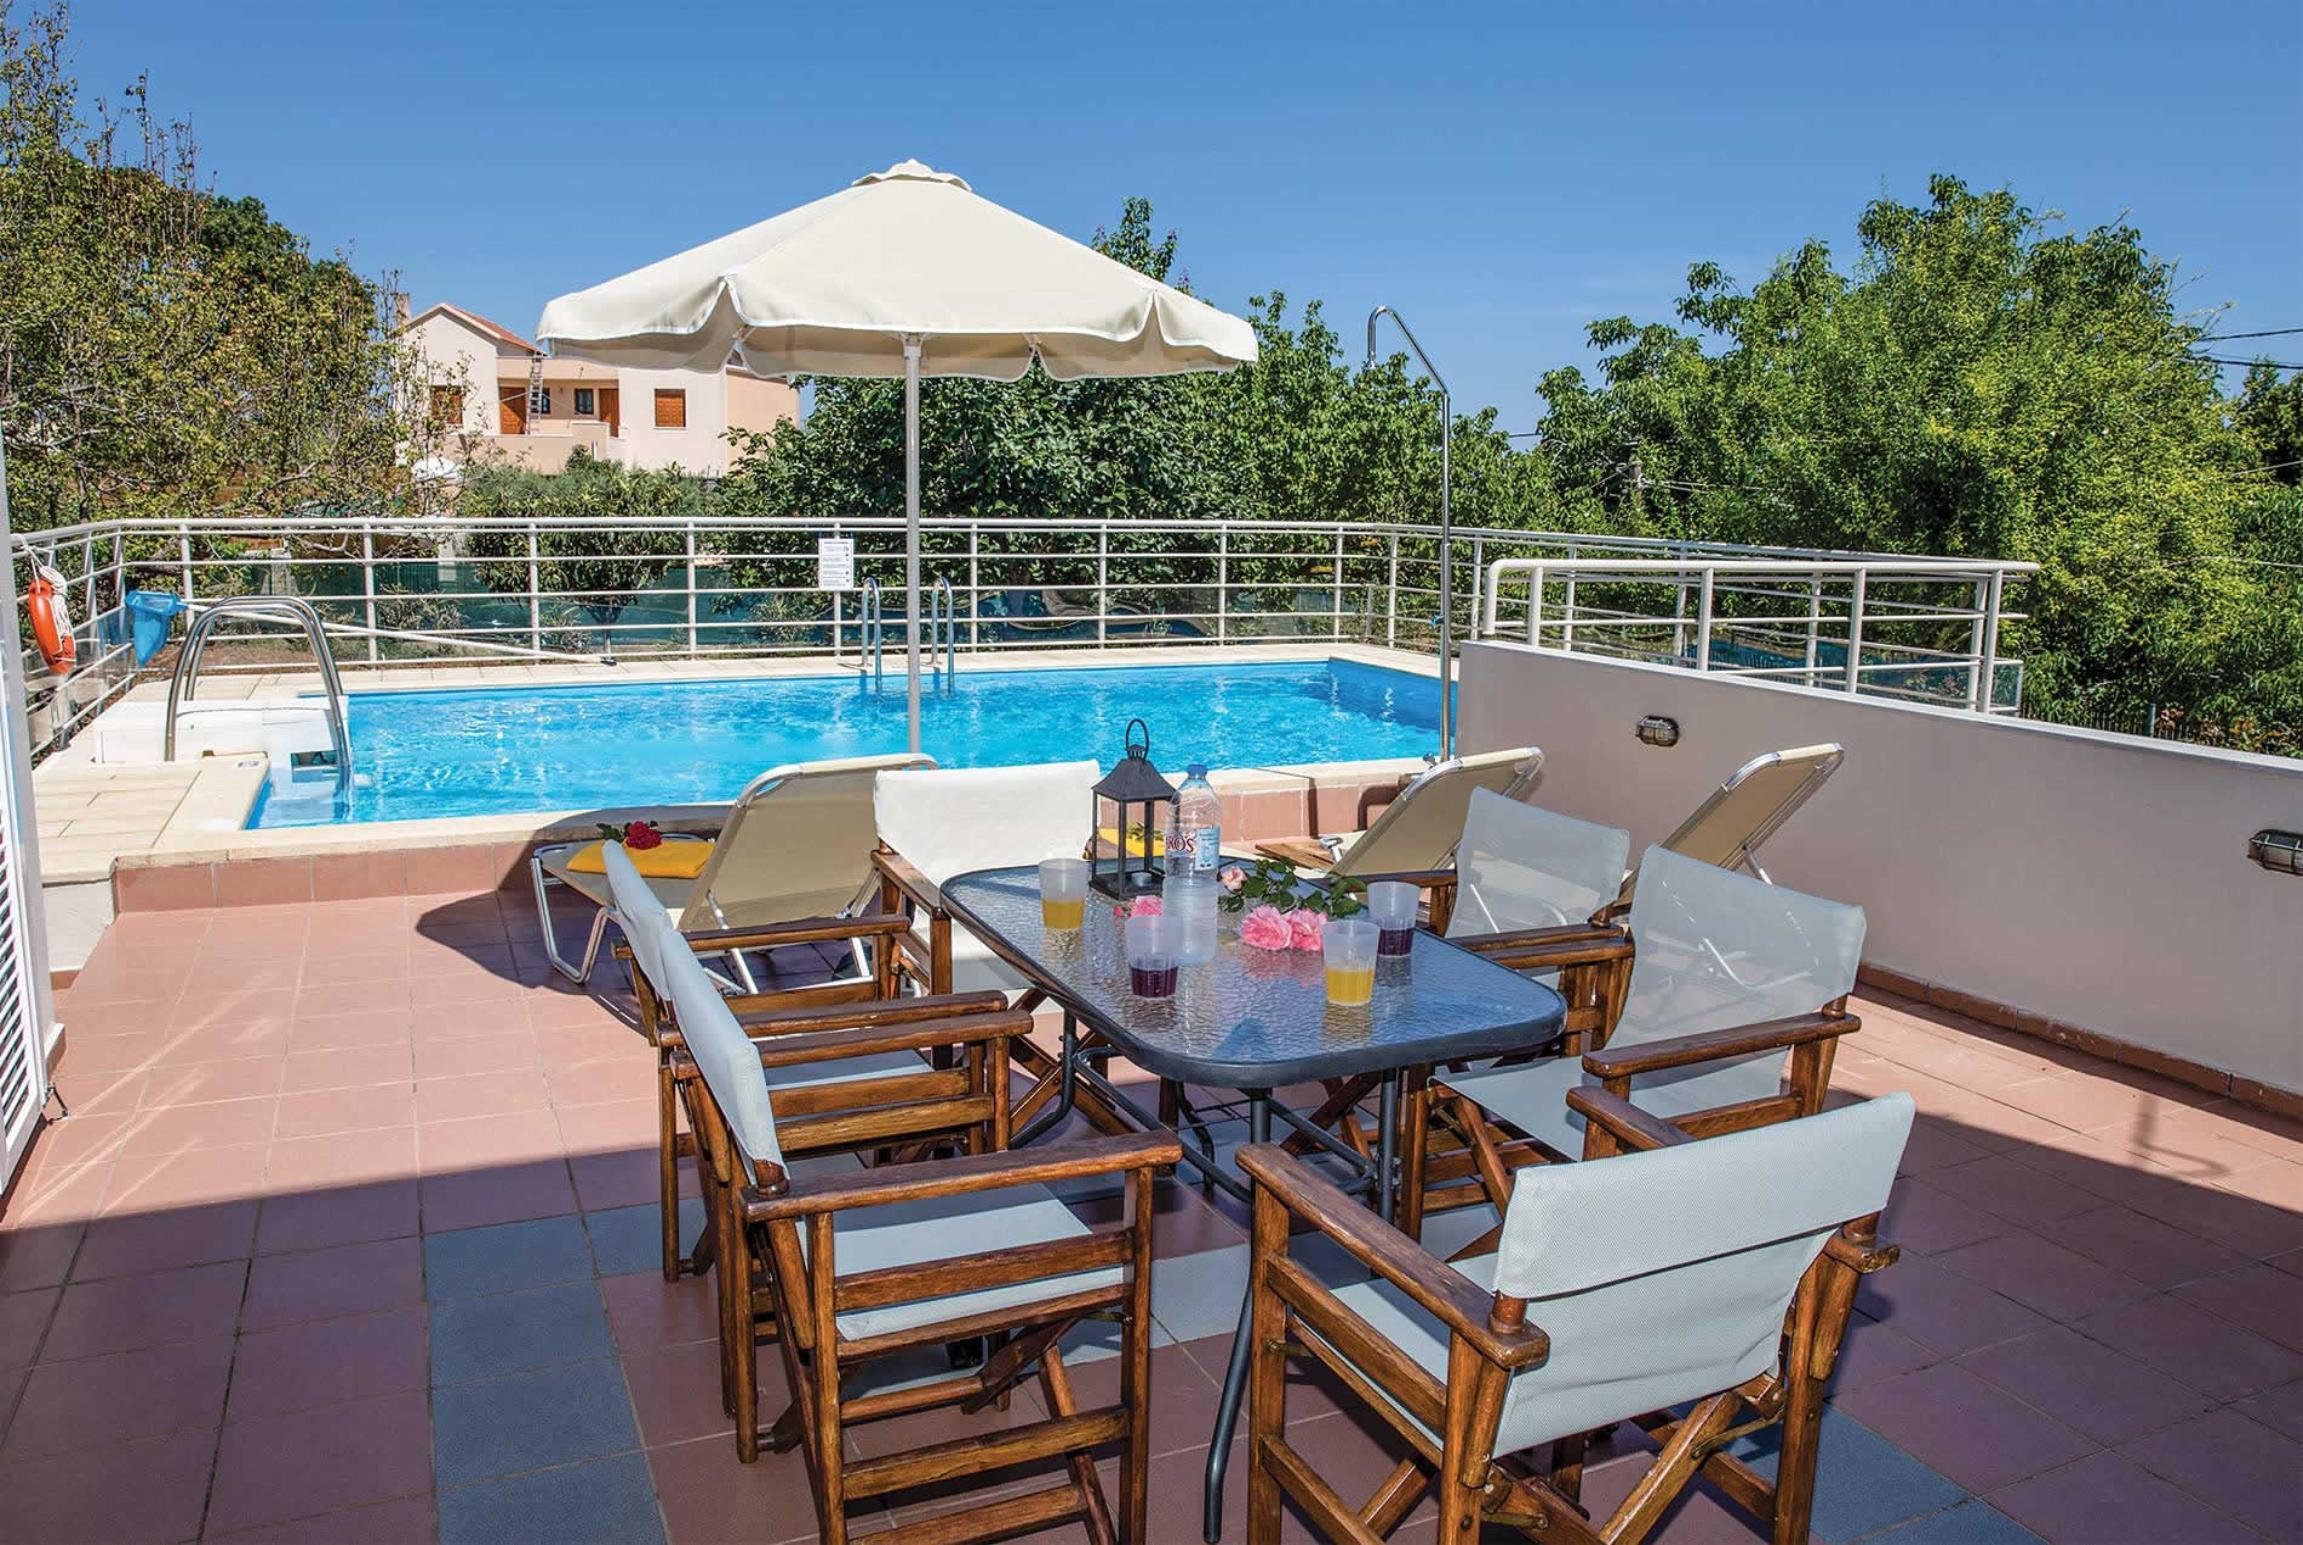 Ferienhaus Filia (2654231), Rethymno, Kreta Nordküste, Kreta, Griechenland, Bild 4